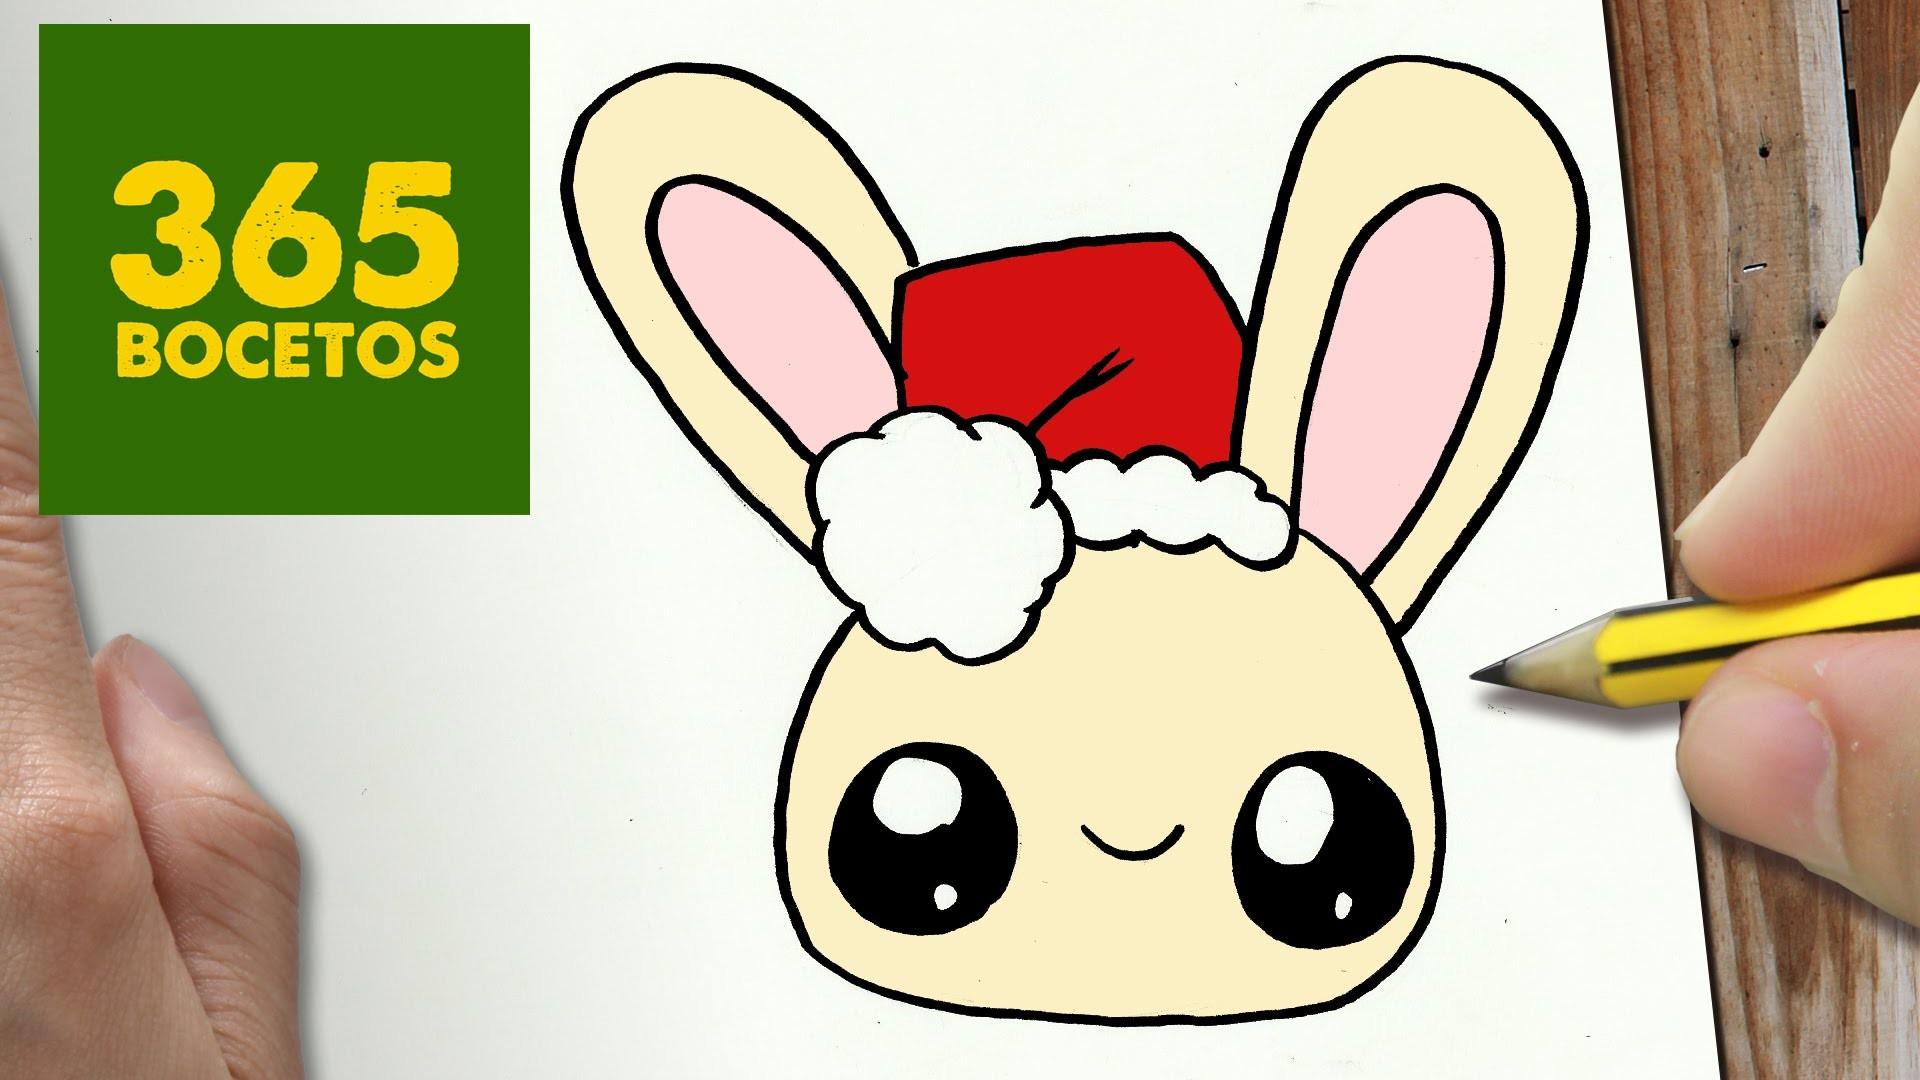 Como Dibujar Un Cuaderno Para Navidad Paso A Paso Dibujos: COMO DIBUJAR UN CONEJO PARA NAVIDAD PASO A PASO: Dibujos